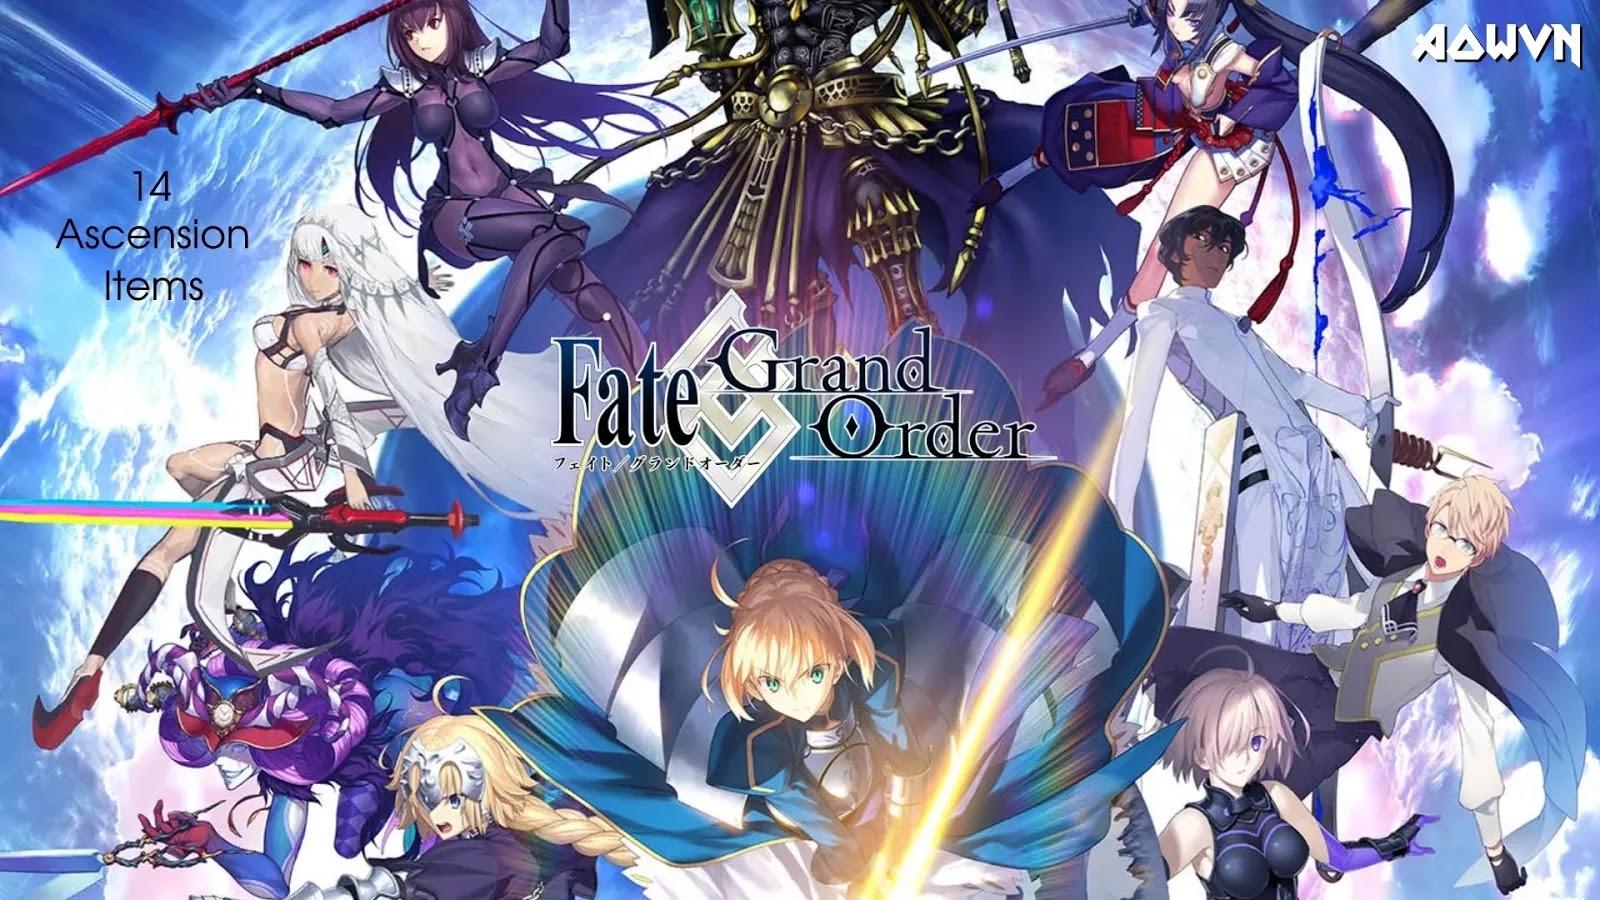 fate order aowvn2 - [ Anime 3gp mp4 ] Fate/Grand Order: First Order | Vietsub – Siêu phẩm cuối năm